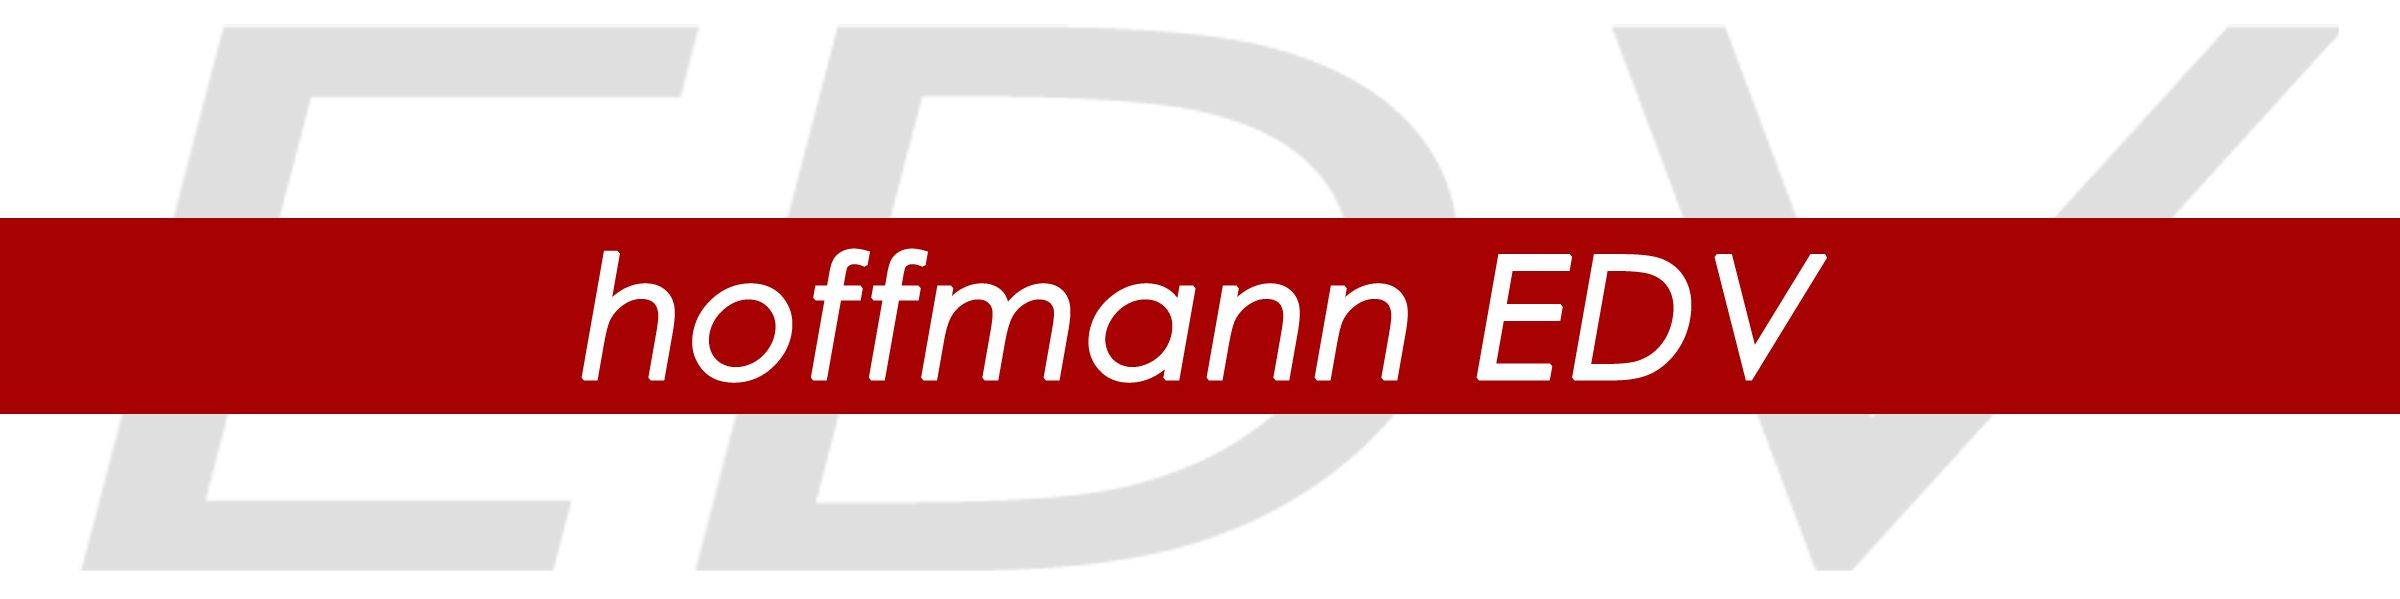 hoffmann-EDV